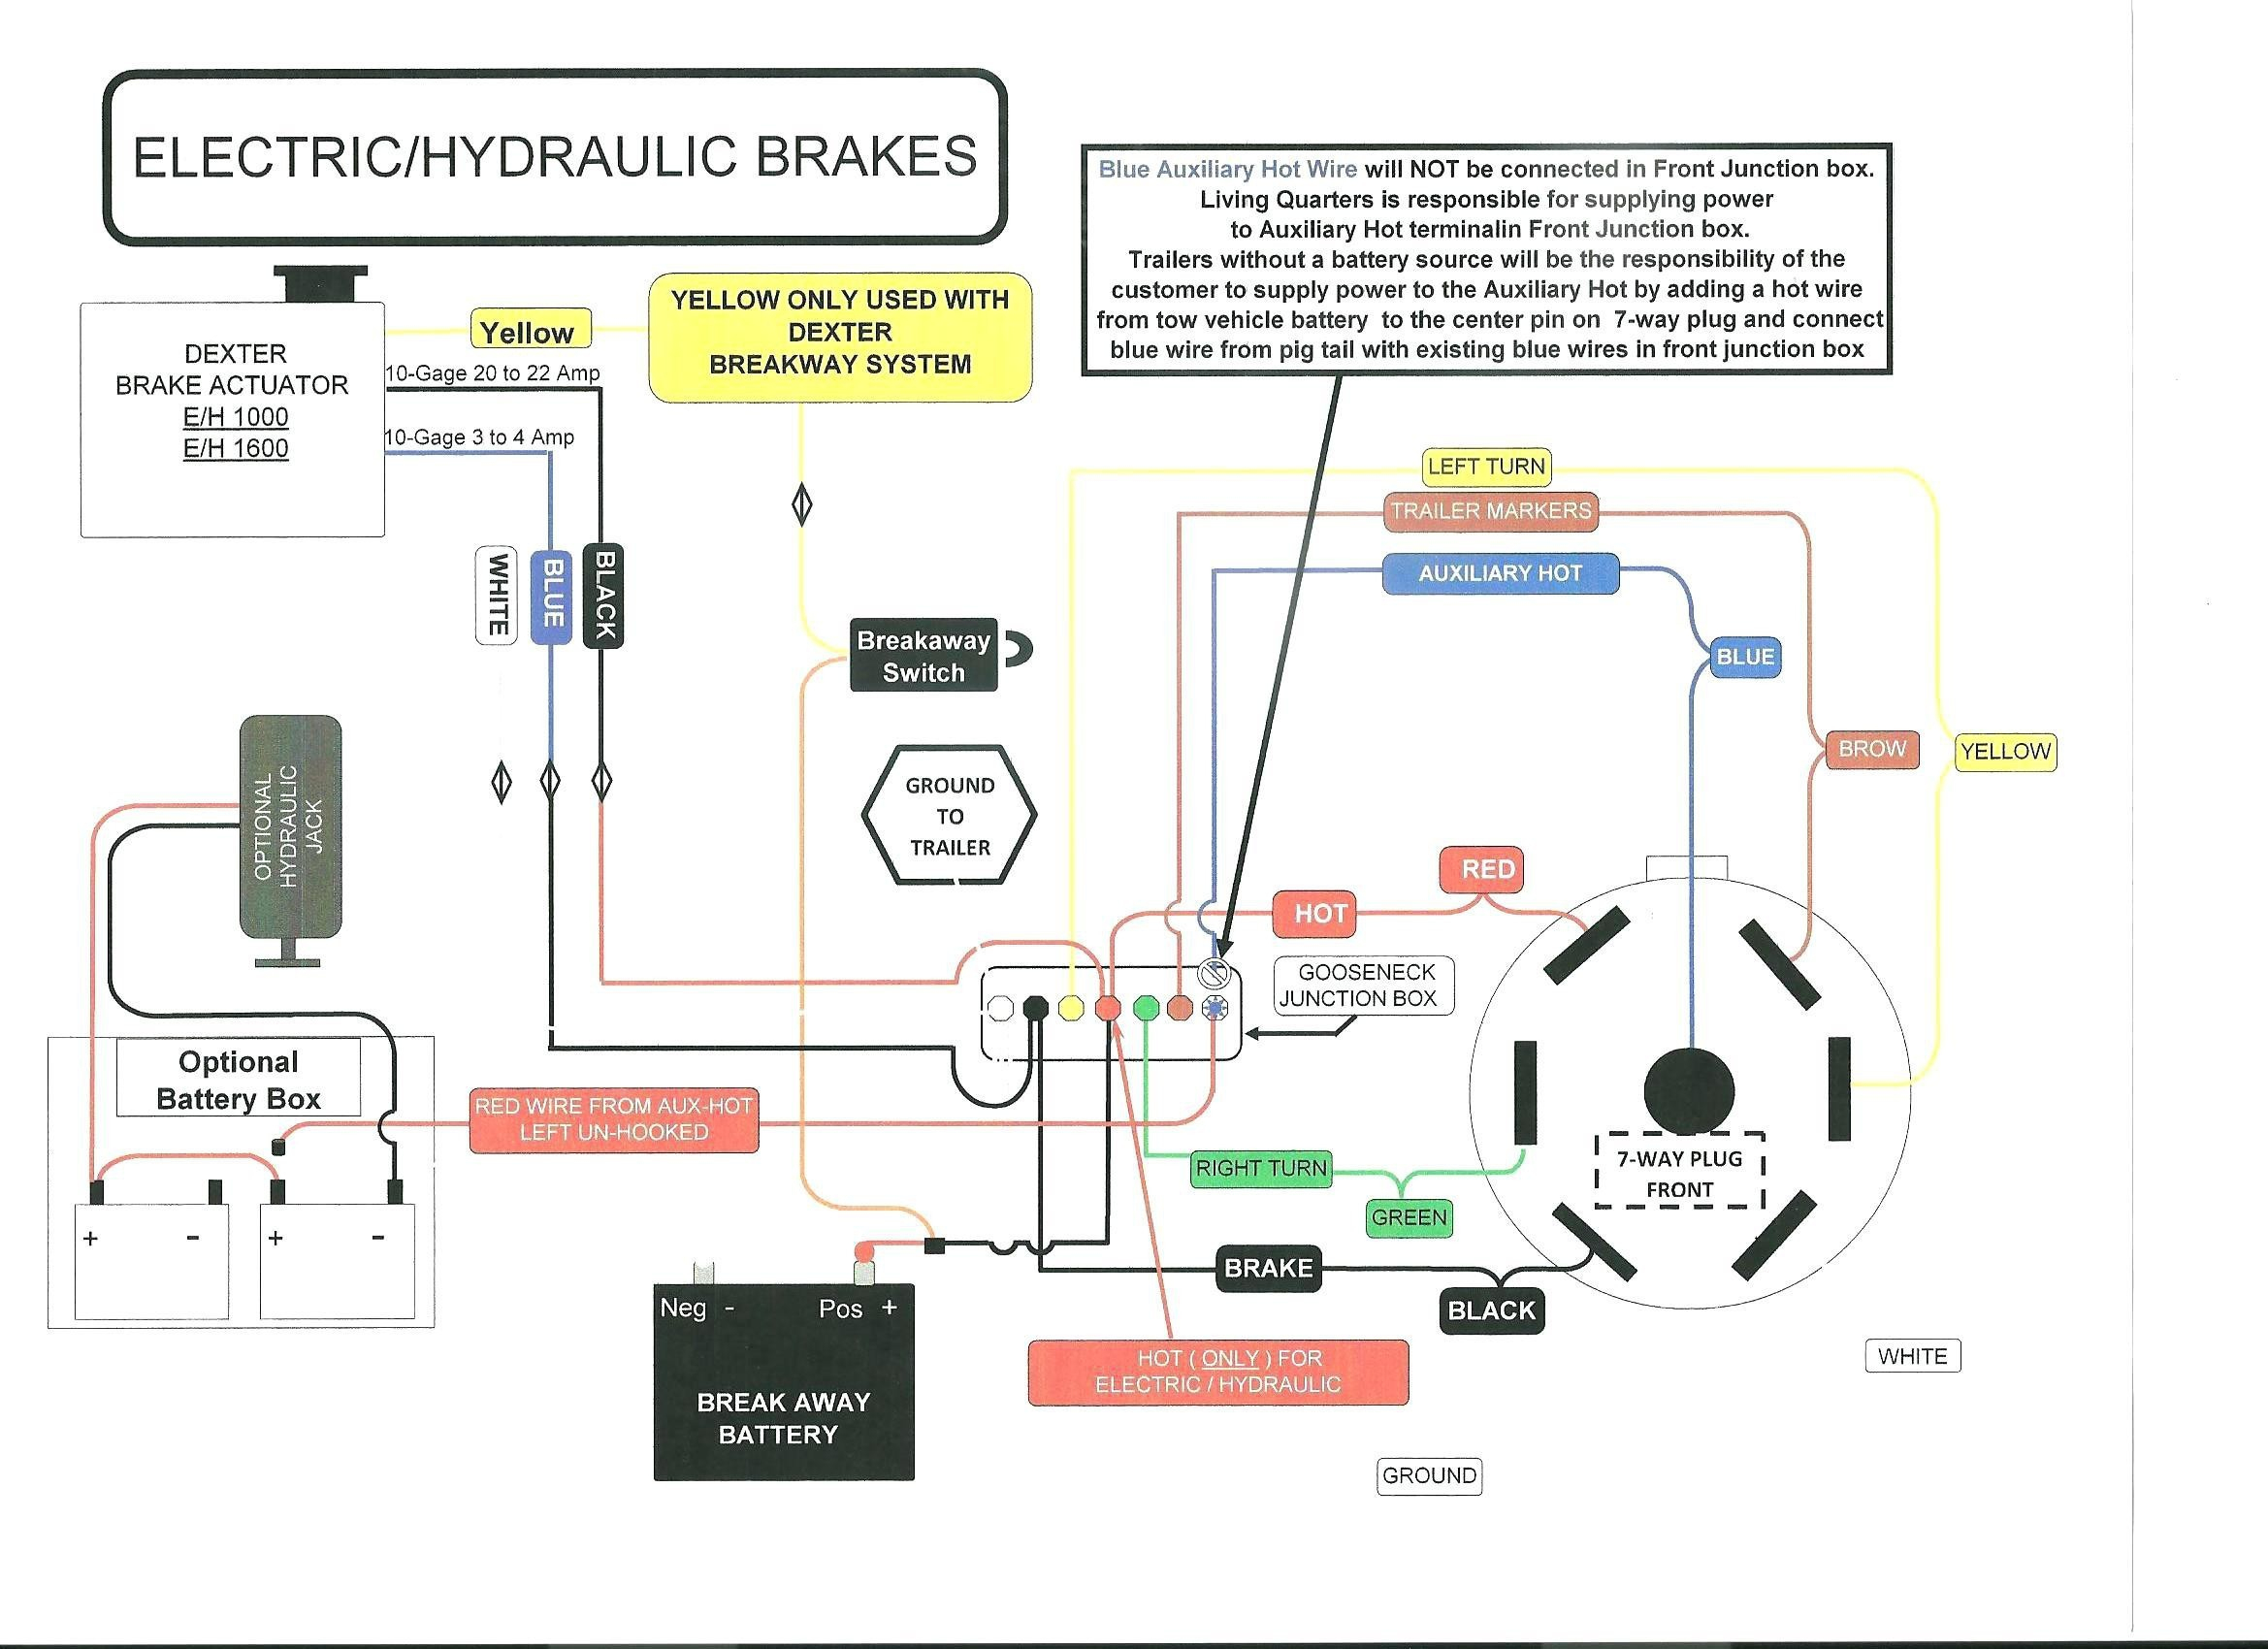 Gooseneck Trailer Breakaway Wiring Diagram   Manual E-Books - Gooseneck Trailer Wiring Diagram